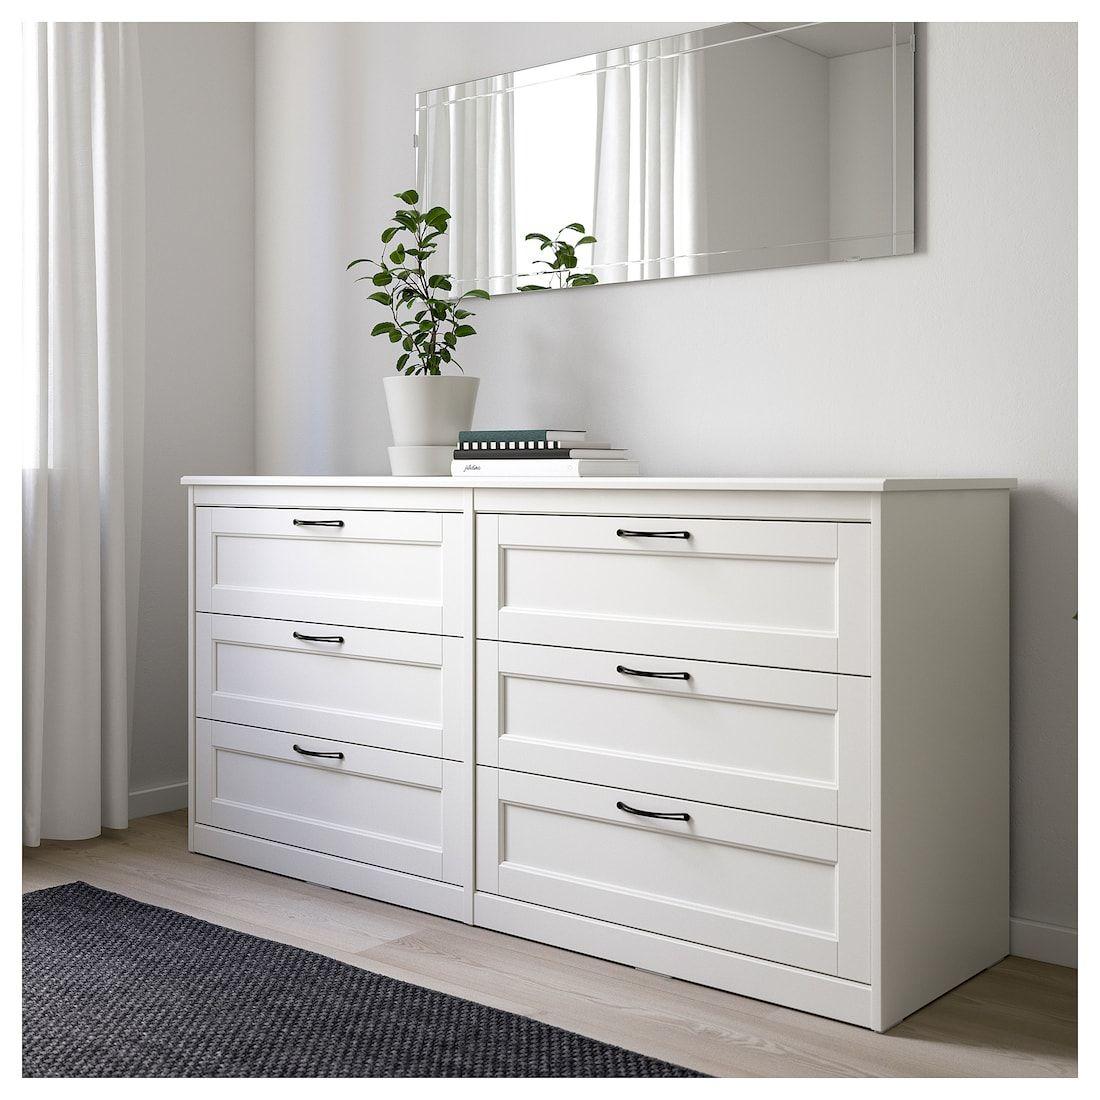 Songesand 6 Drawer Dresser White 63 3 8x31 7 8 Ikea Muebles De Dormitorio Blanco Decoracion De Comoda De Dormitorio Muebles Dormitorio [ 1100 x 1100 Pixel ]